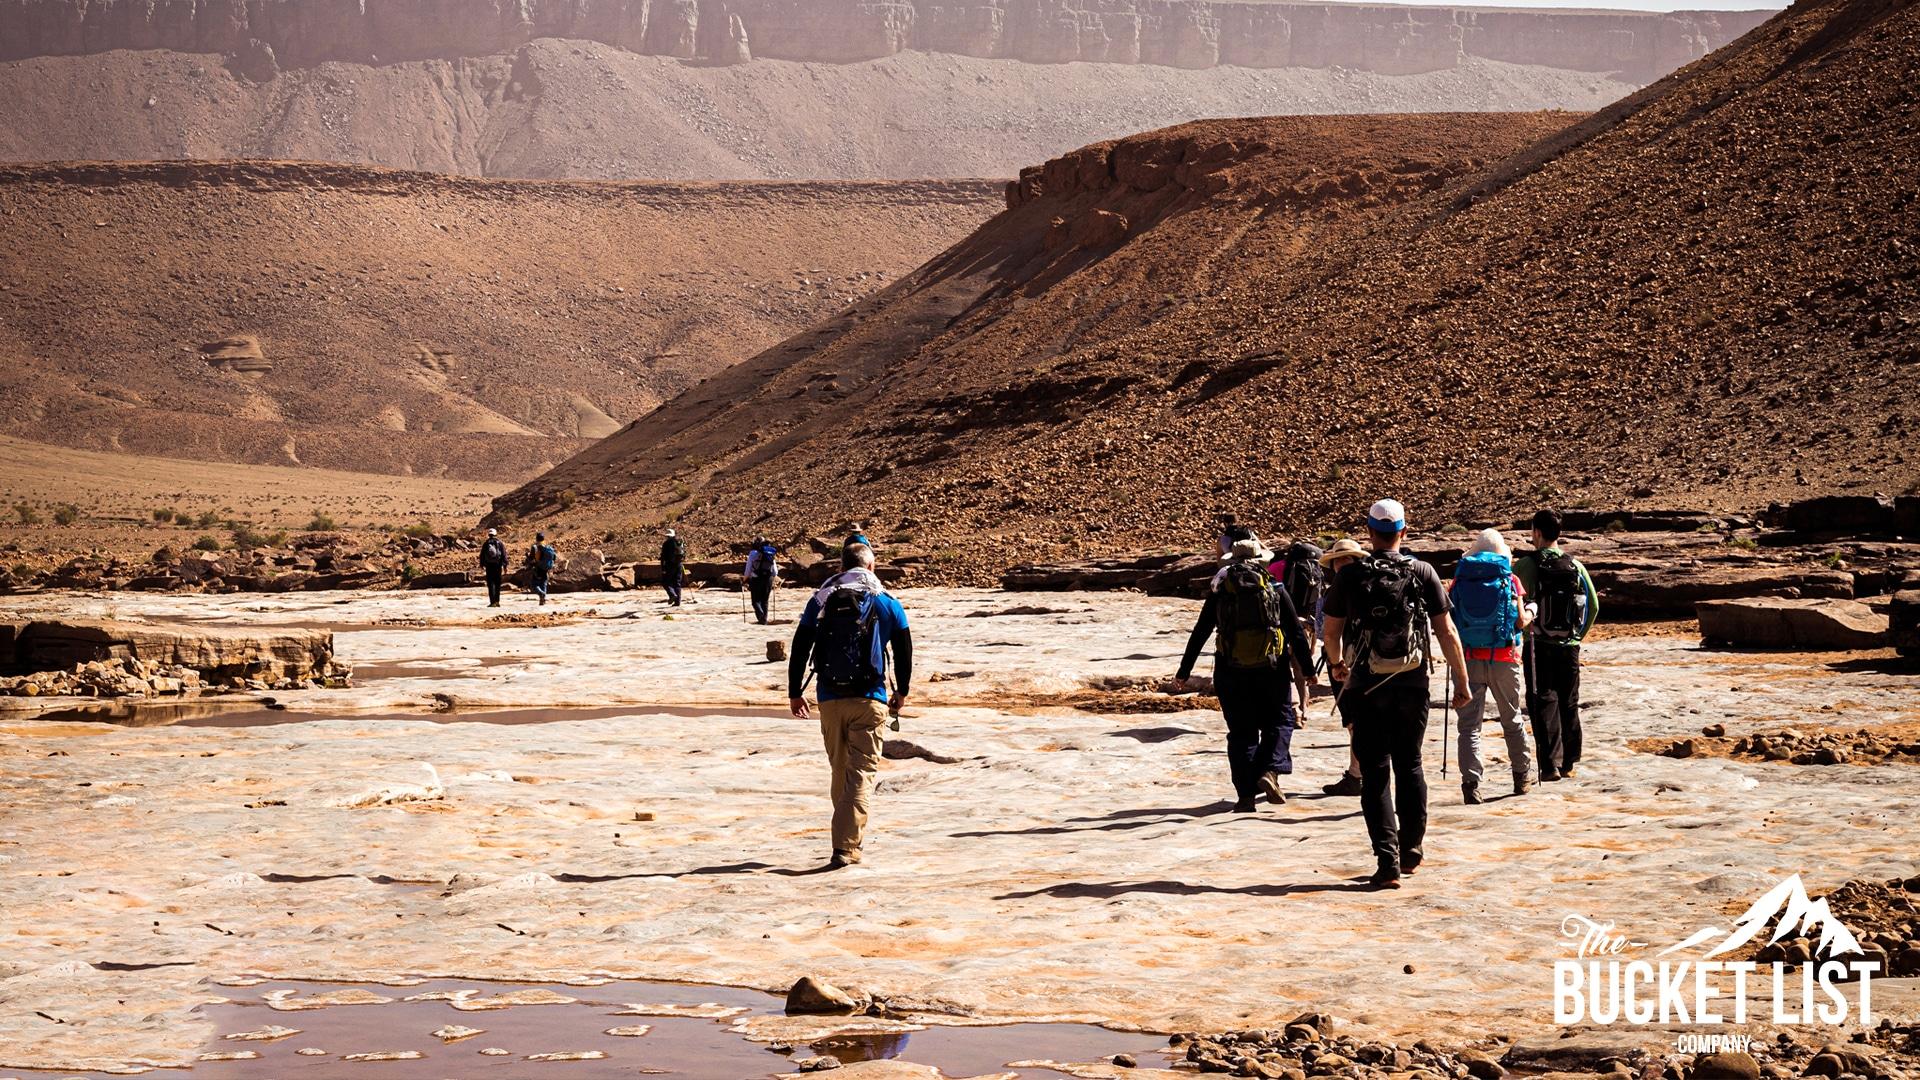 a Group of trekkers walking through the sahara desert